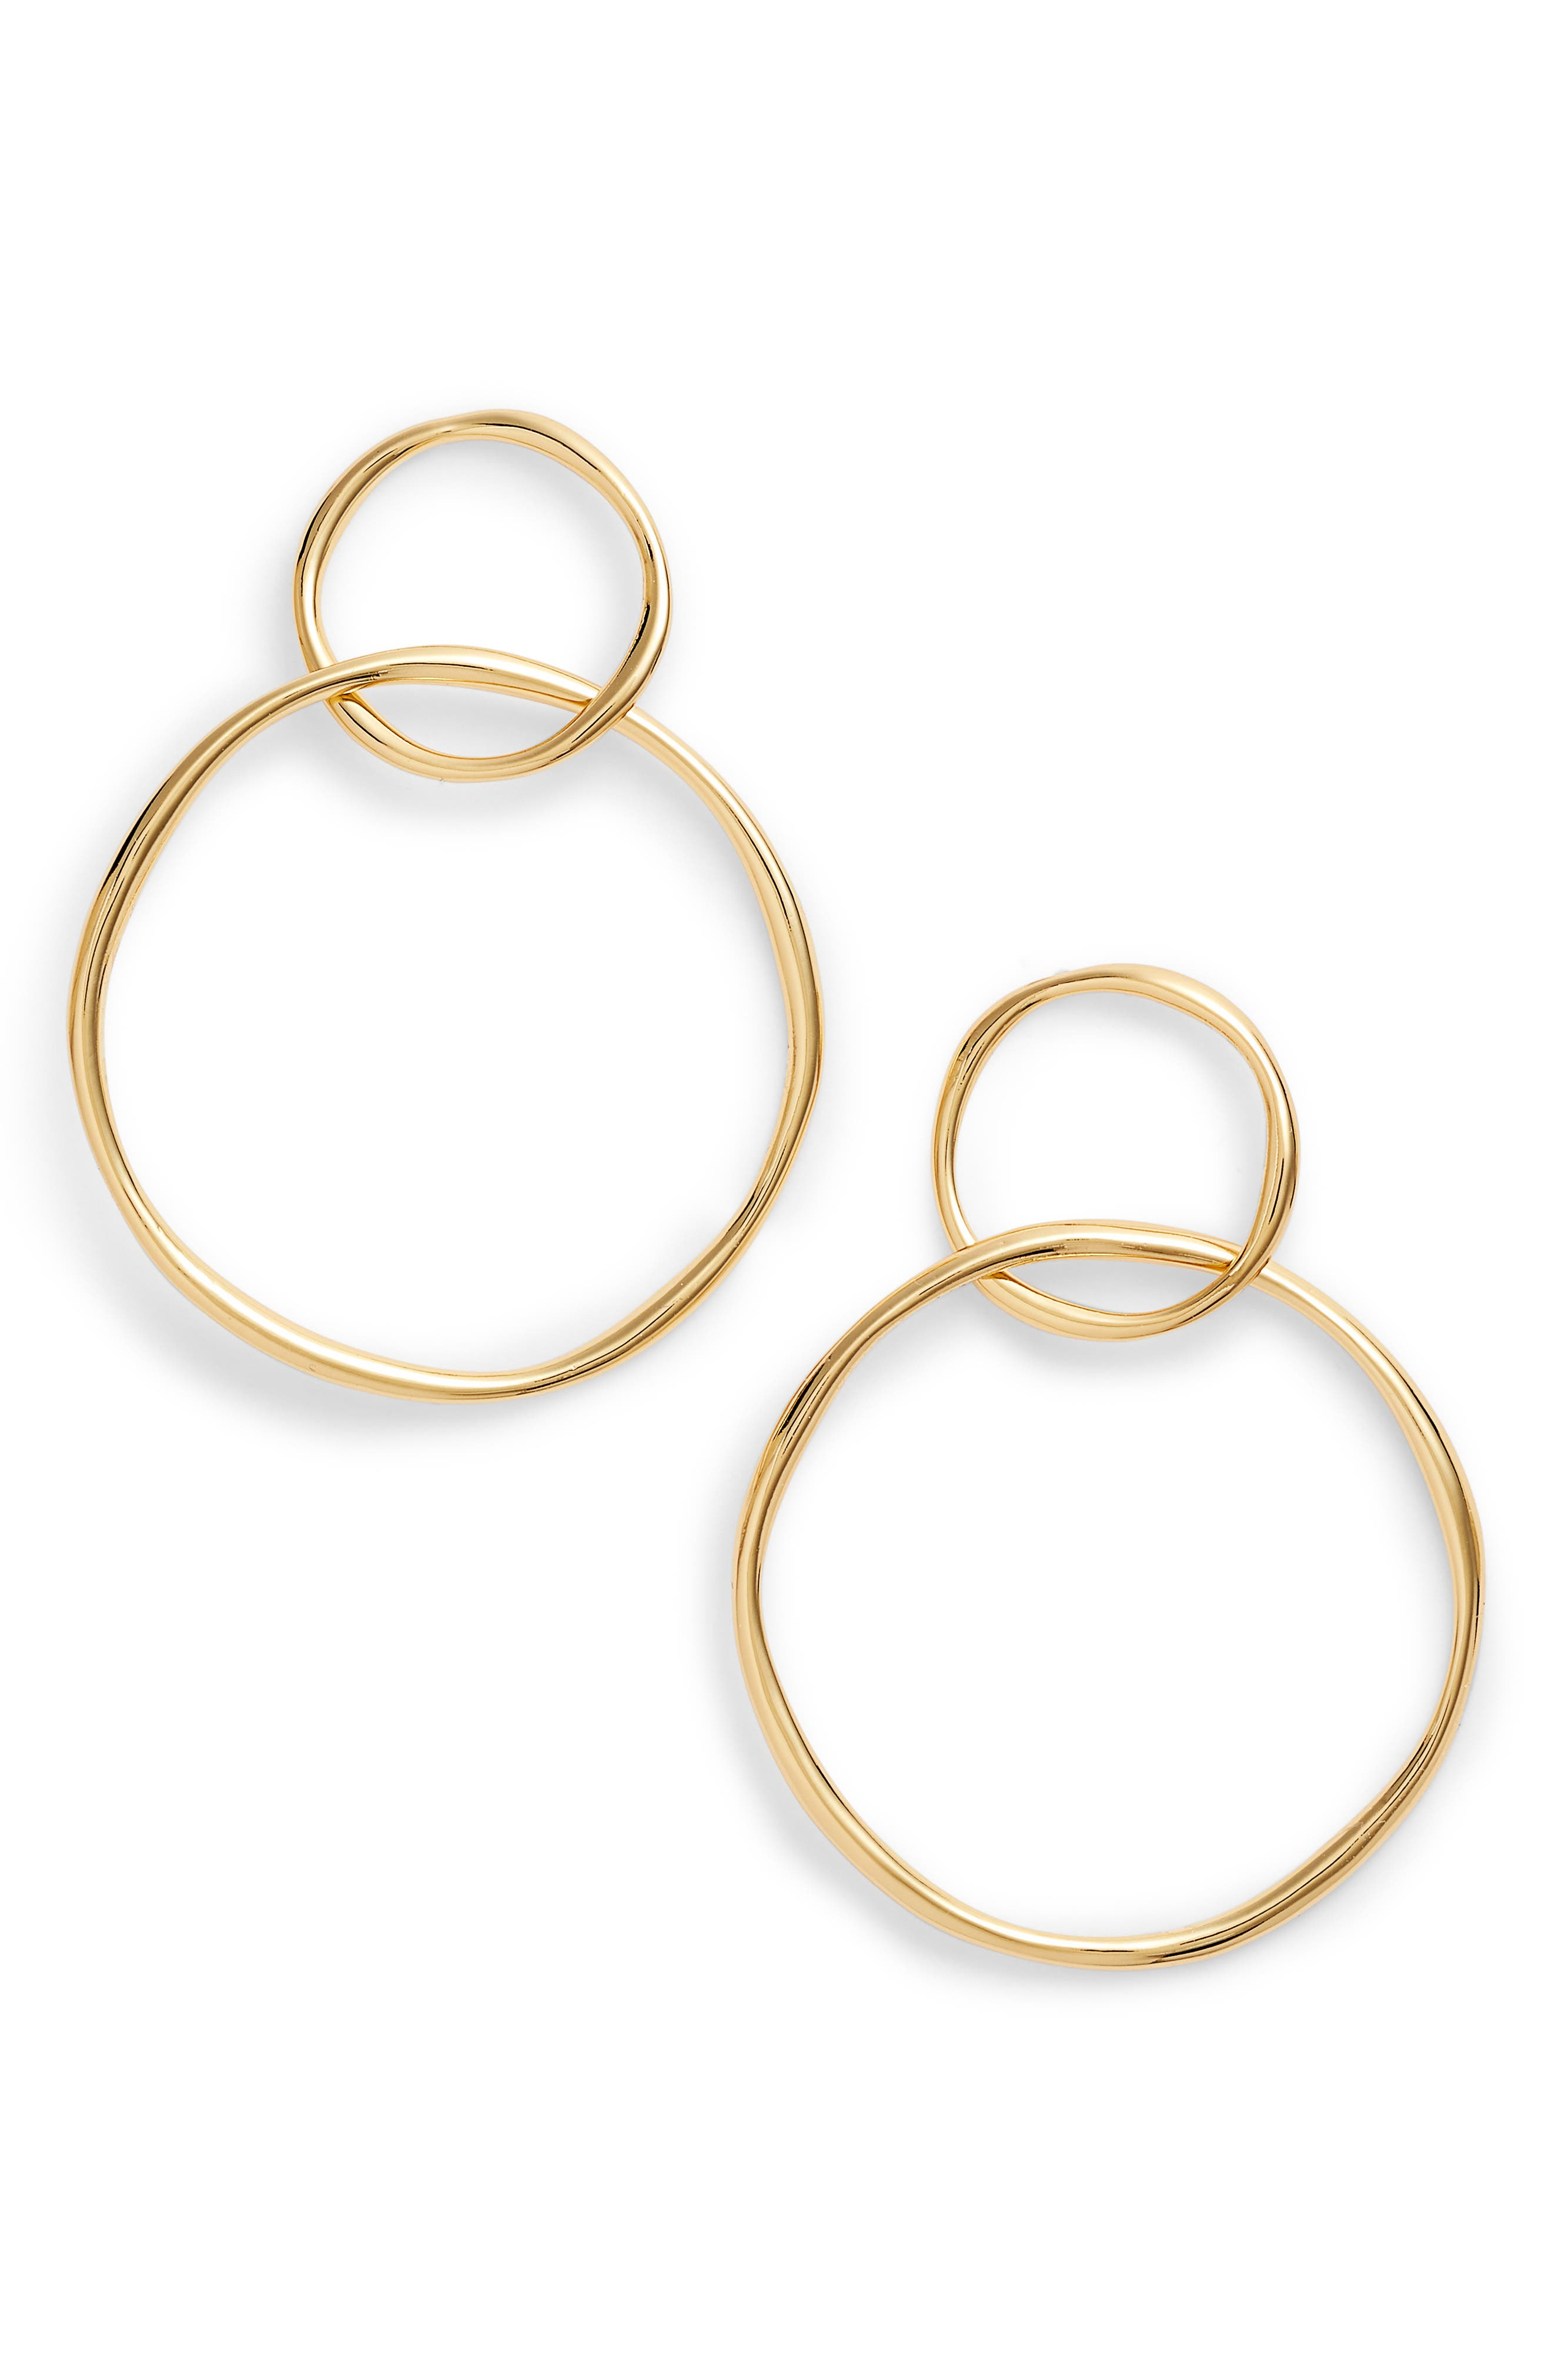 GORJANA,                             Kellen Linked Drop Earrings,                             Main thumbnail 1, color,                             710